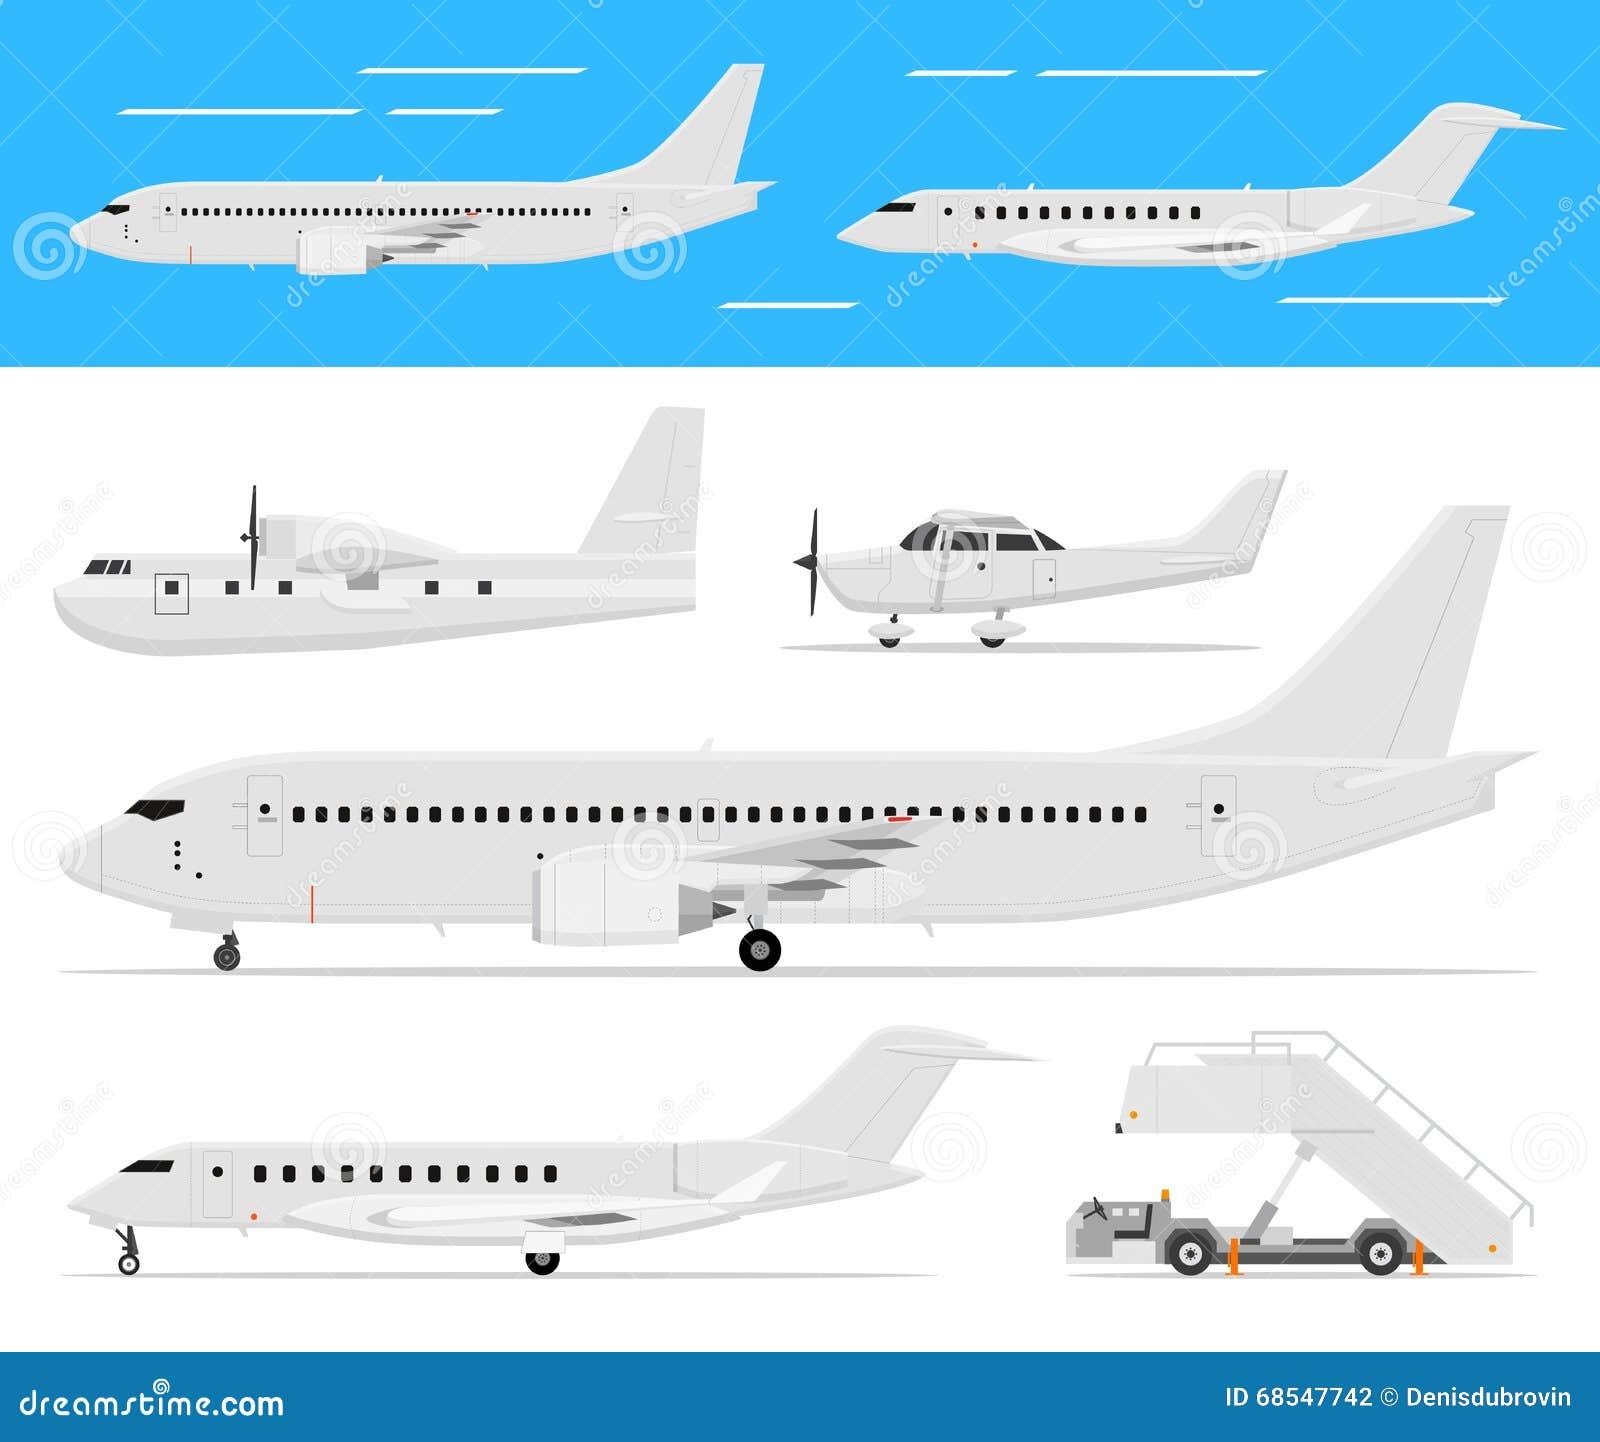 MH17 crash: History of passenger planes shot down - bbc.com